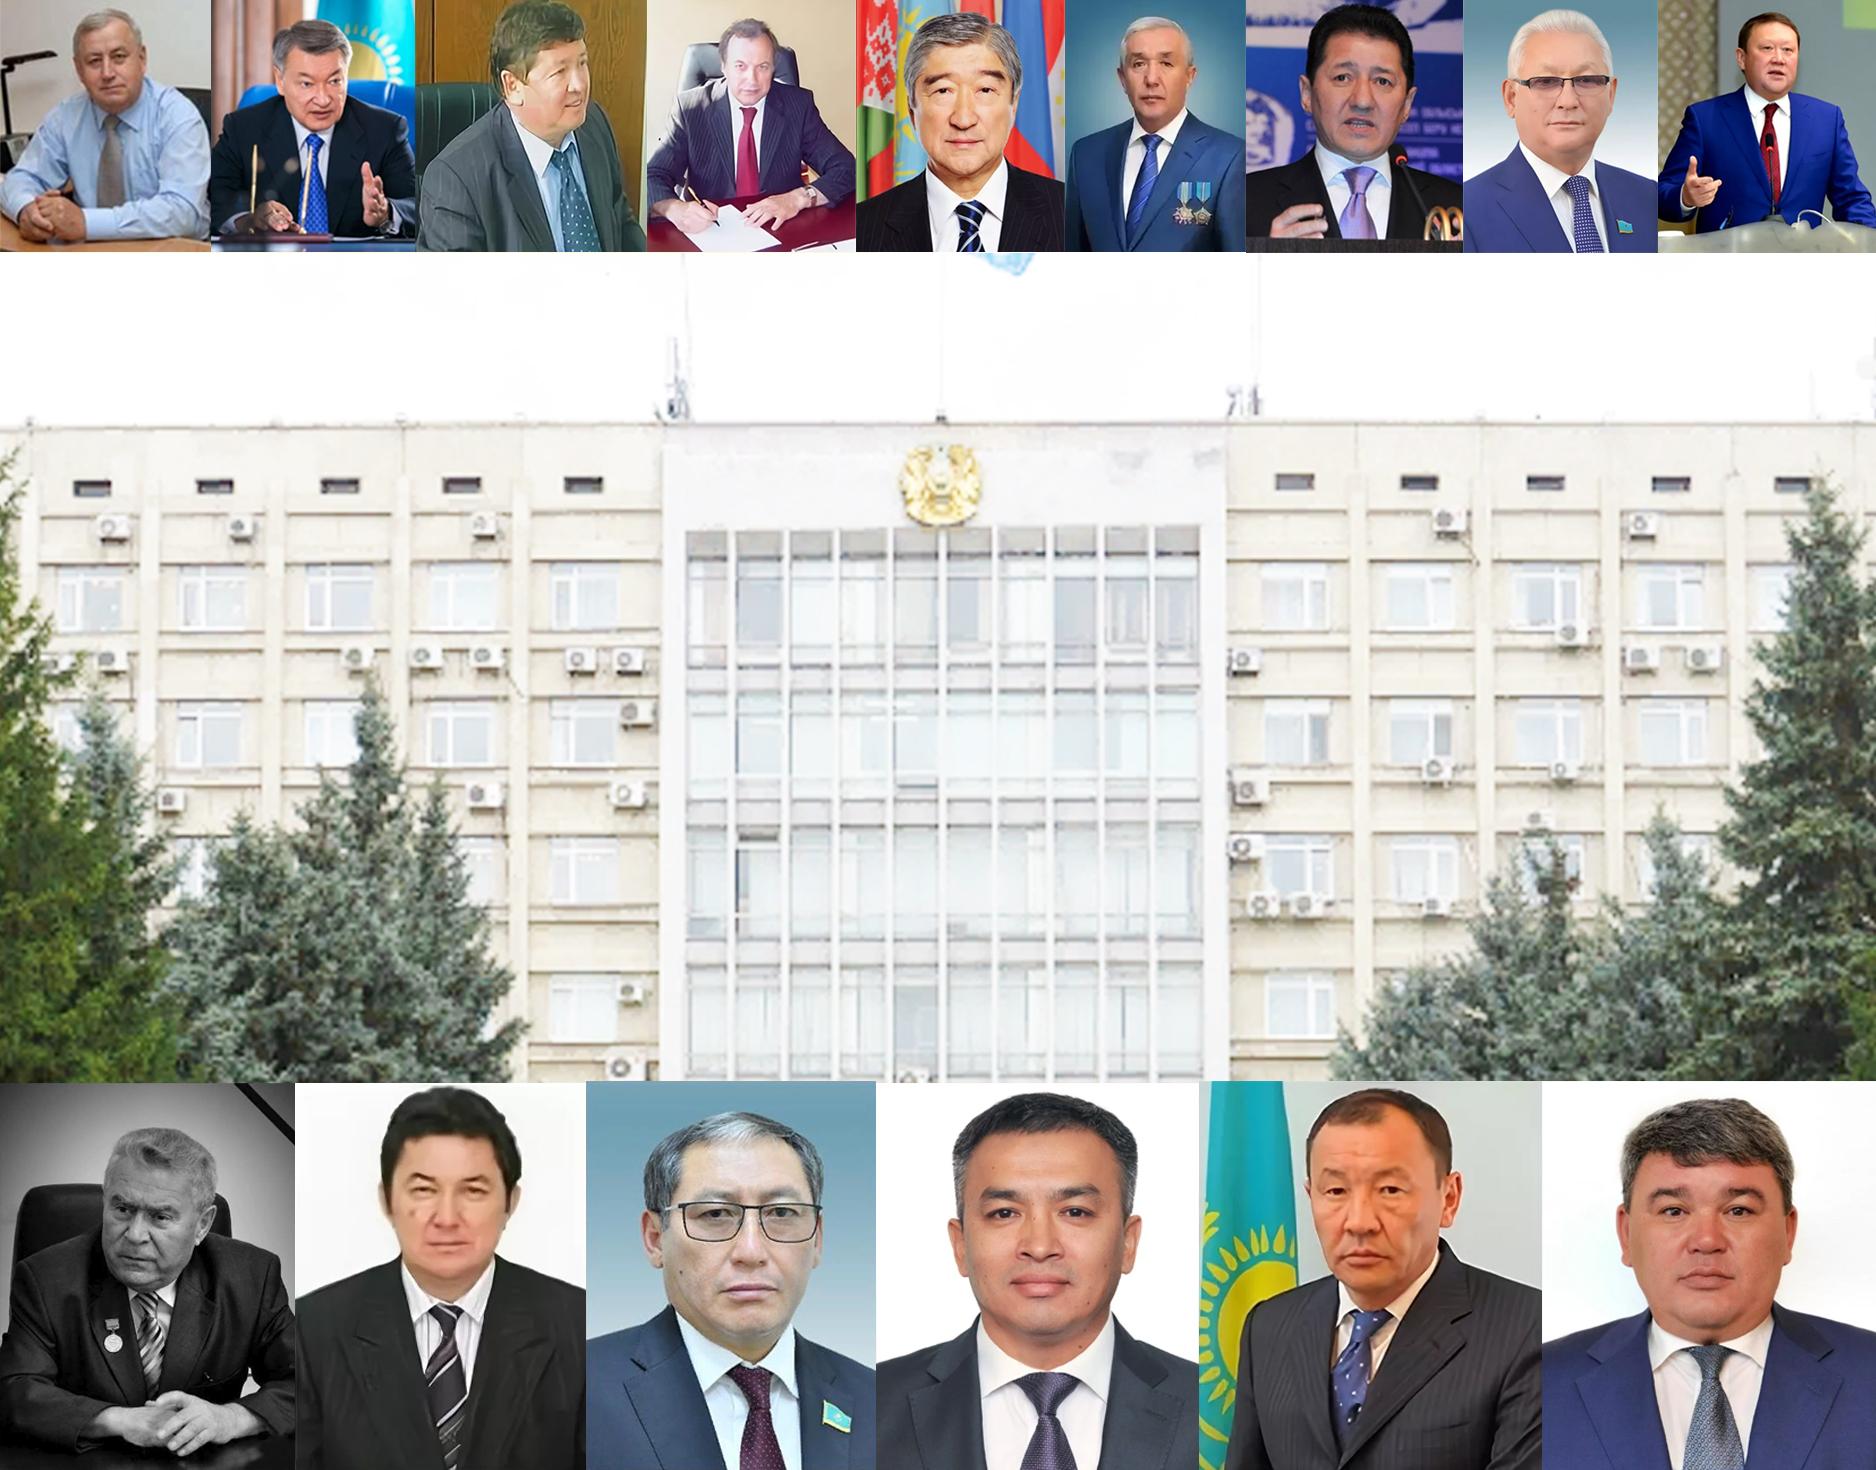 Трамплин для акима. Сколько служат руководители на севере Казахстана